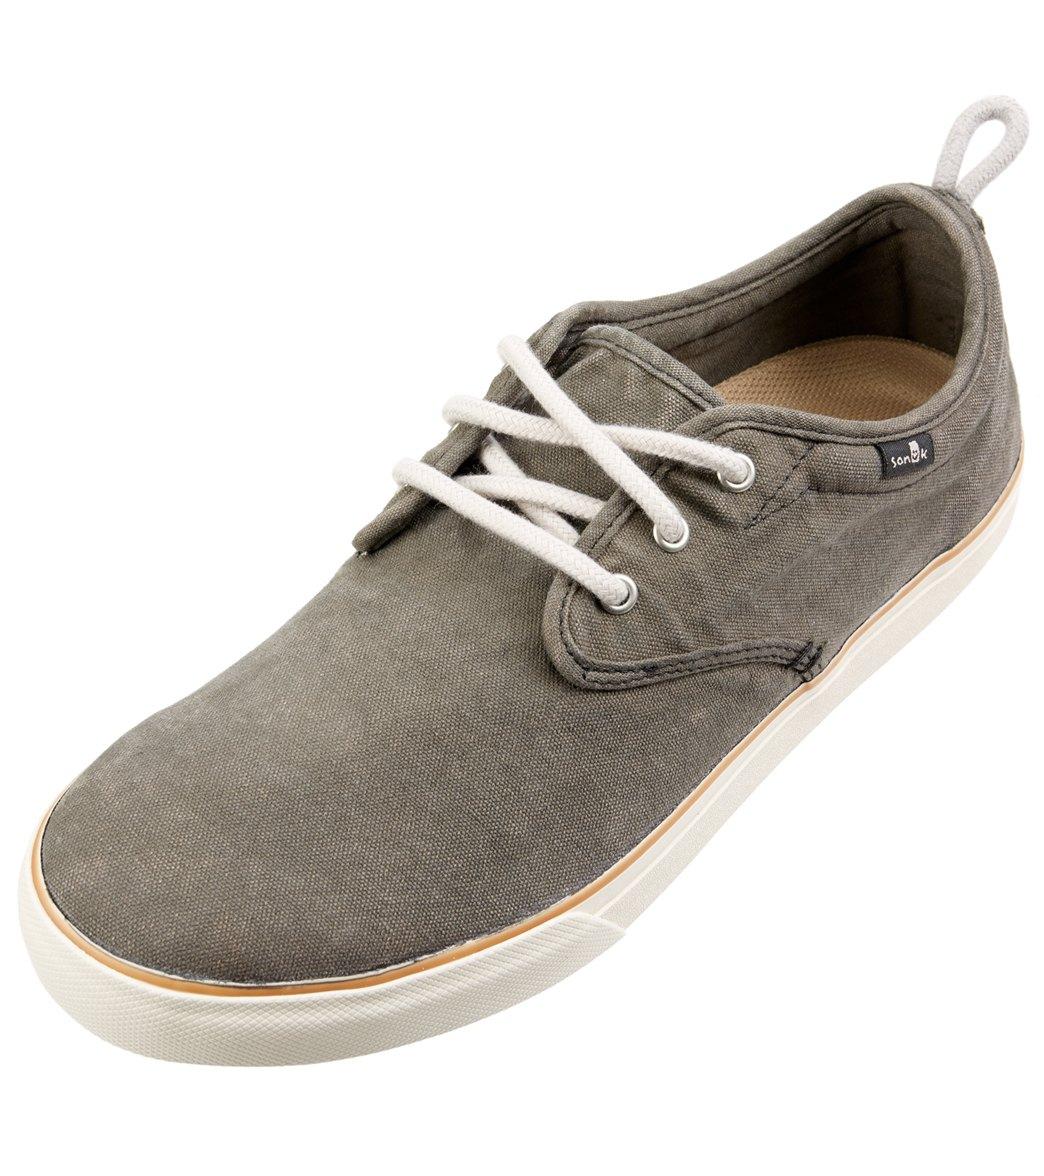 SANUK Men's Guide Plus Shoes, Washed Black